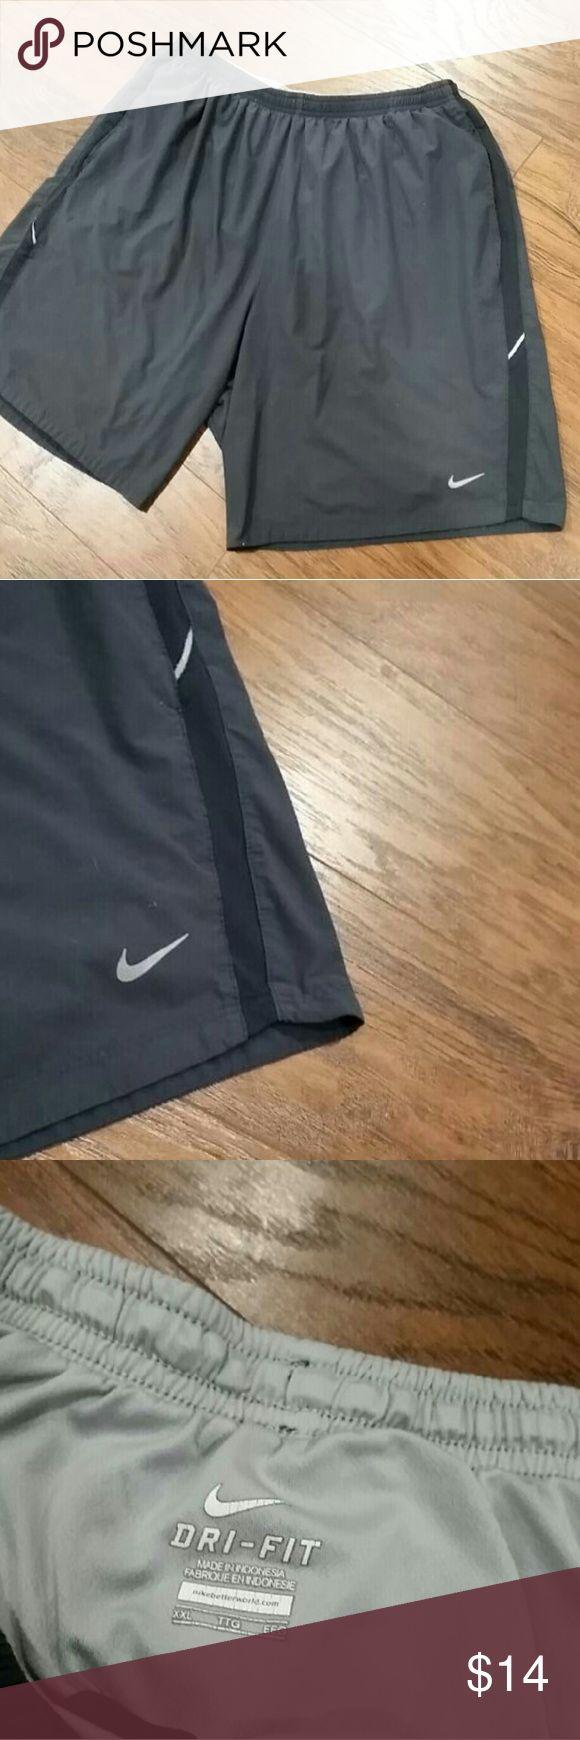 Men's Nike XXL shorts Nike Men's shorts XXL. Used, Good condition, have 2 side pockets Nike Shorts Athletic